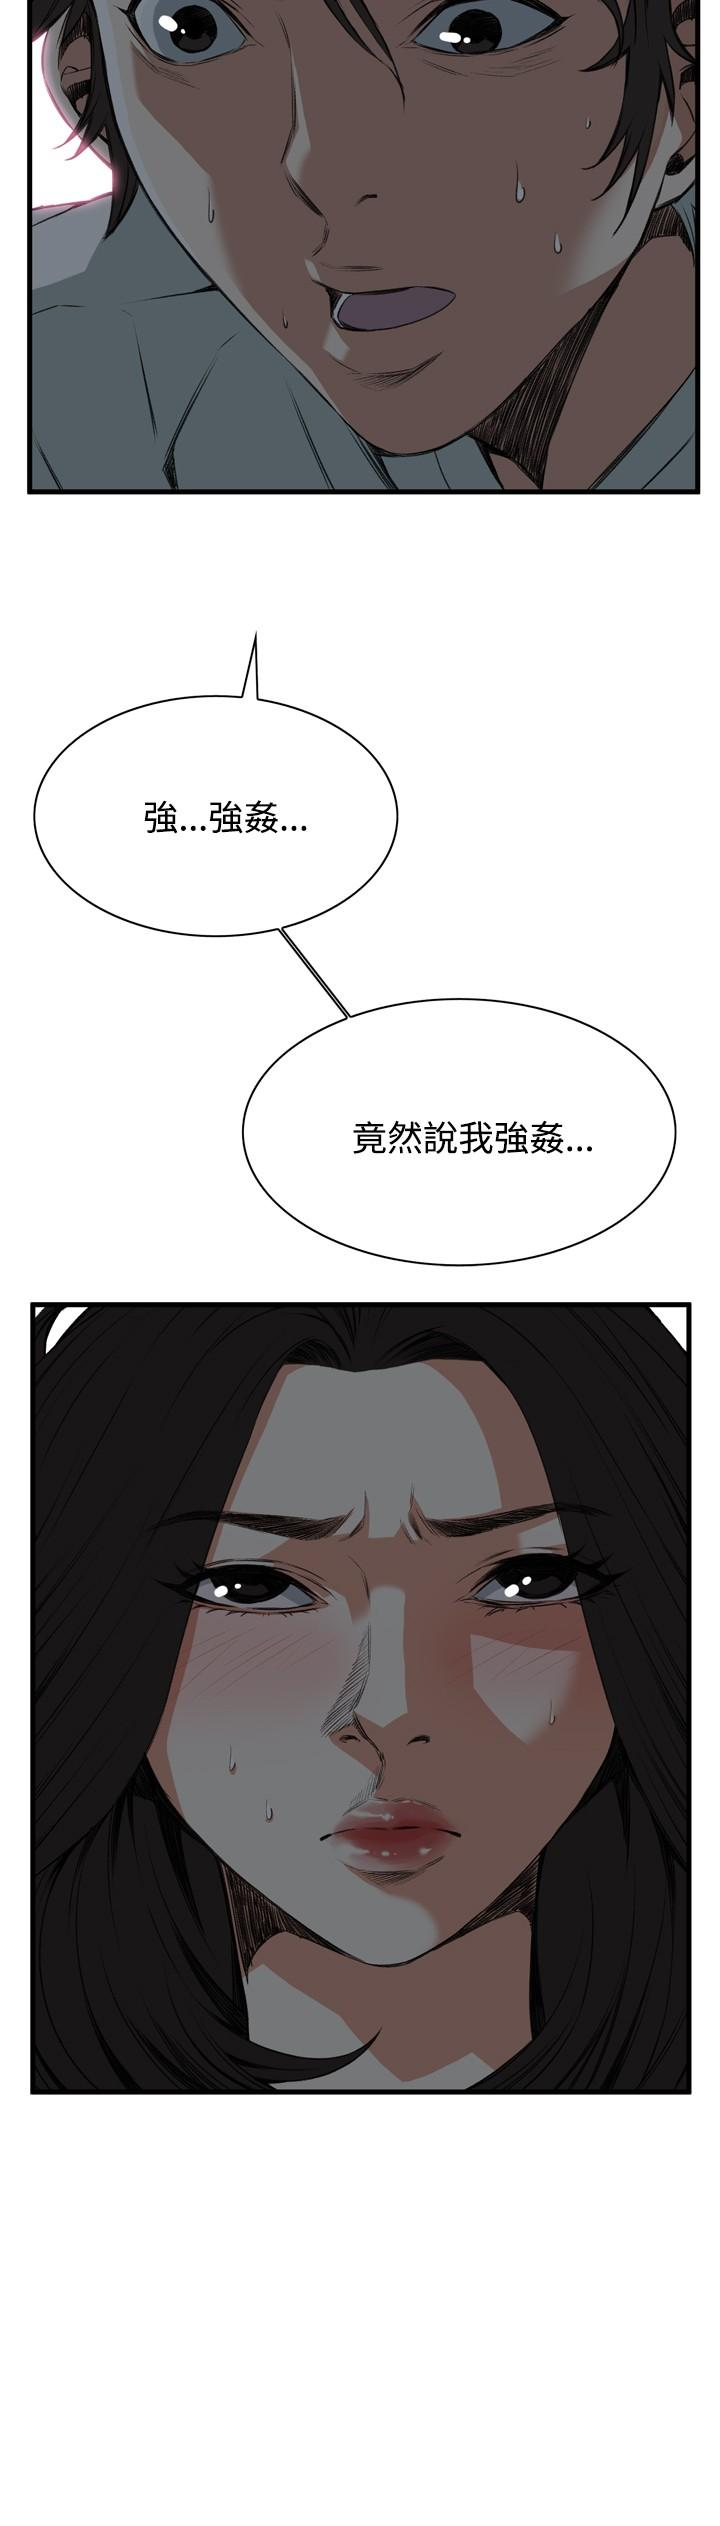 Take a Peek 偷窥 Ch.39~51 [Chinese]中文 198